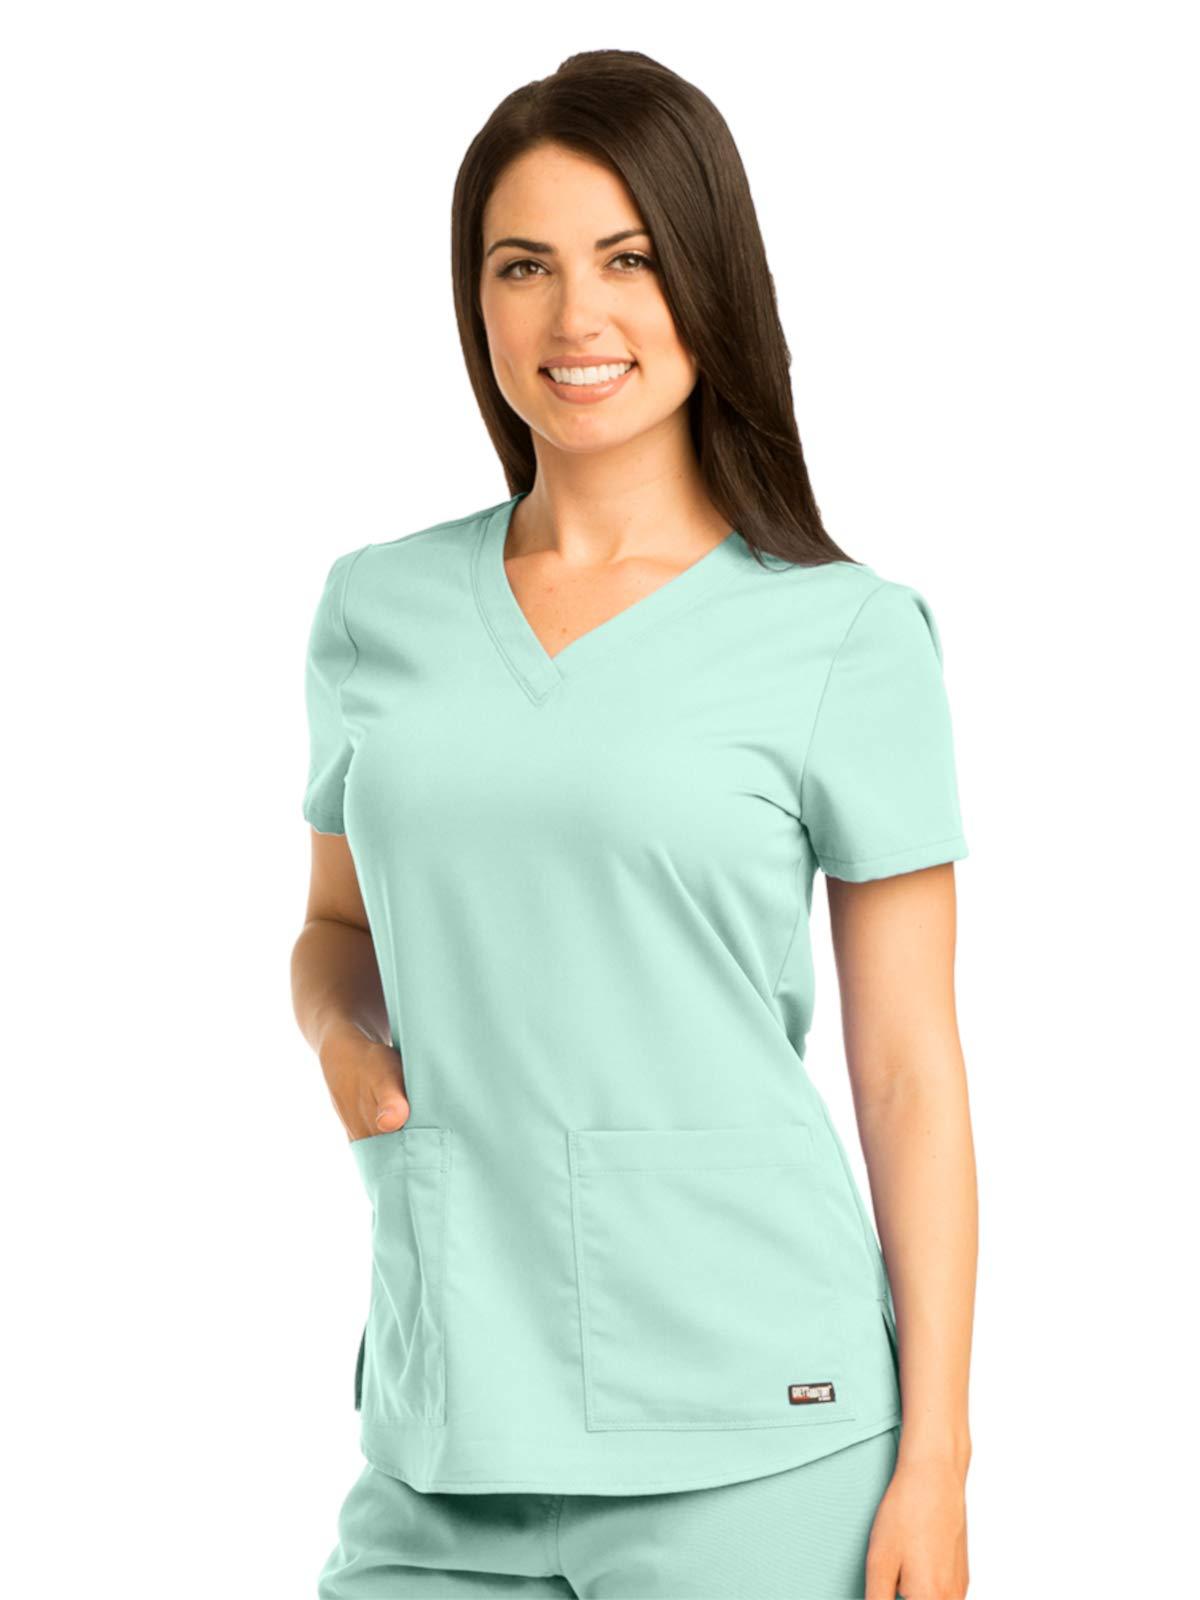 Grey's Anatomy 71166 V-Neck Top Aqua Mist 2XL by Barco